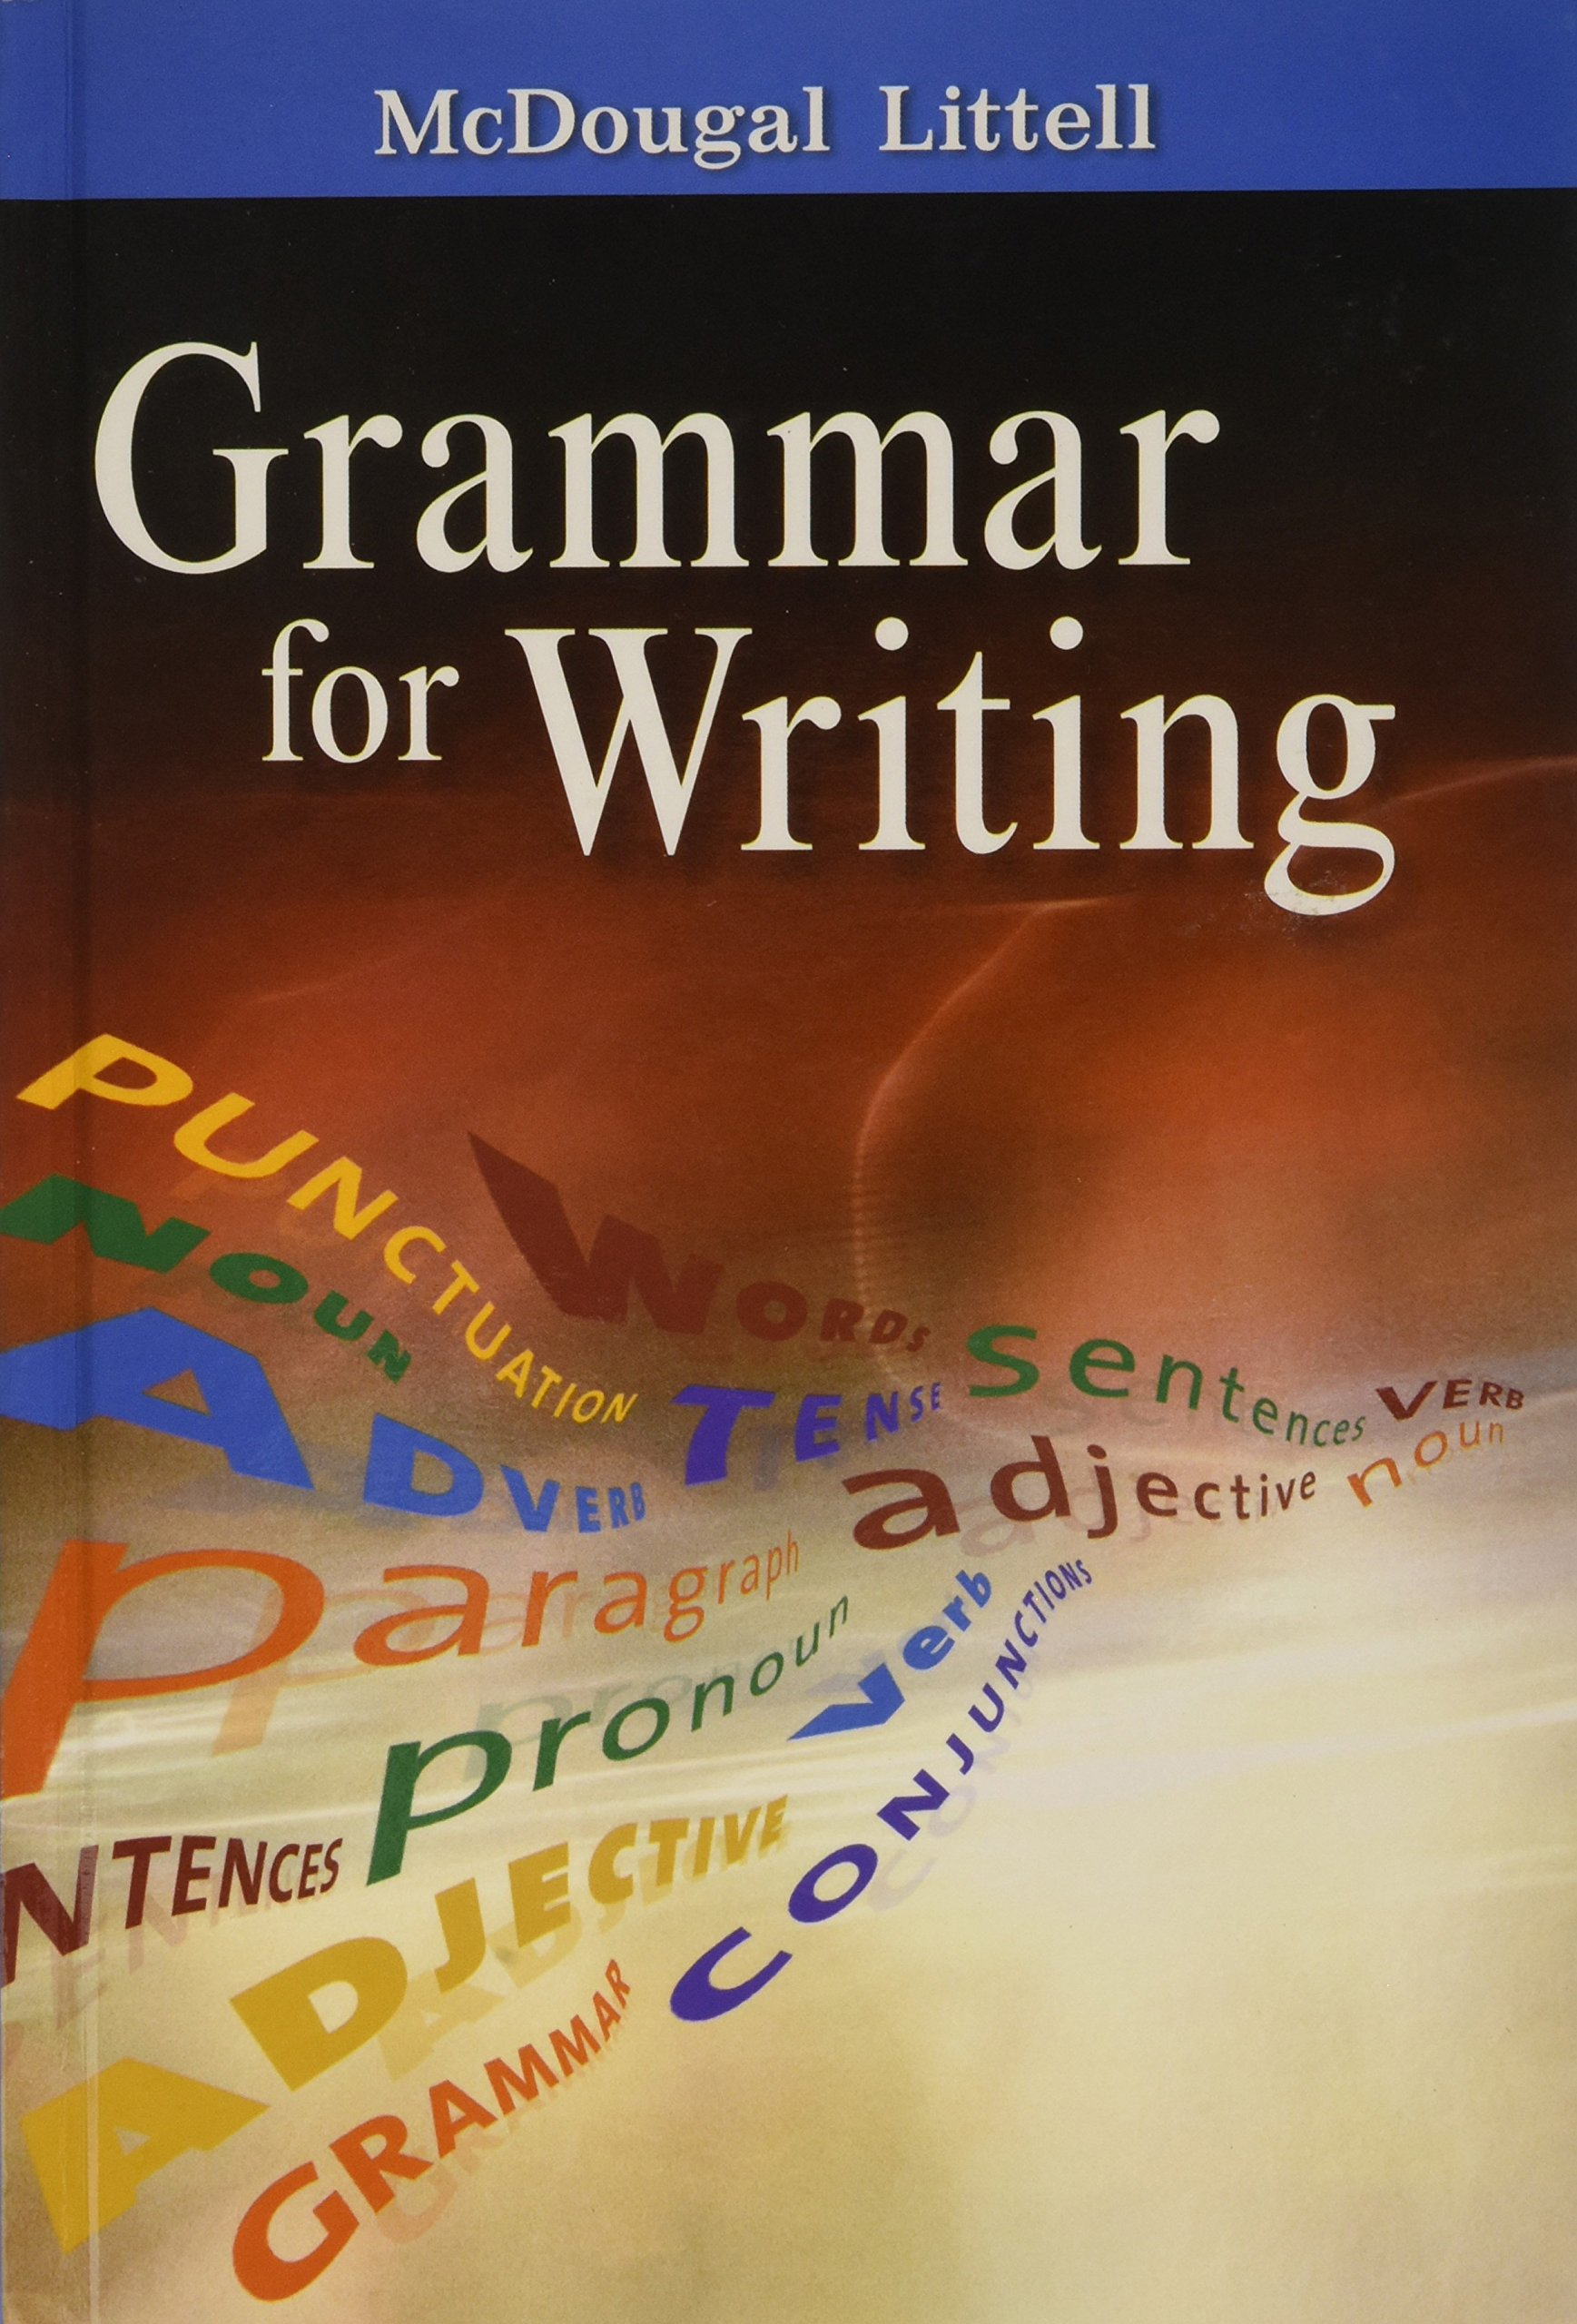 Download McDougal Littell Literature: Grammar for Writing Grade 10 pdf epub